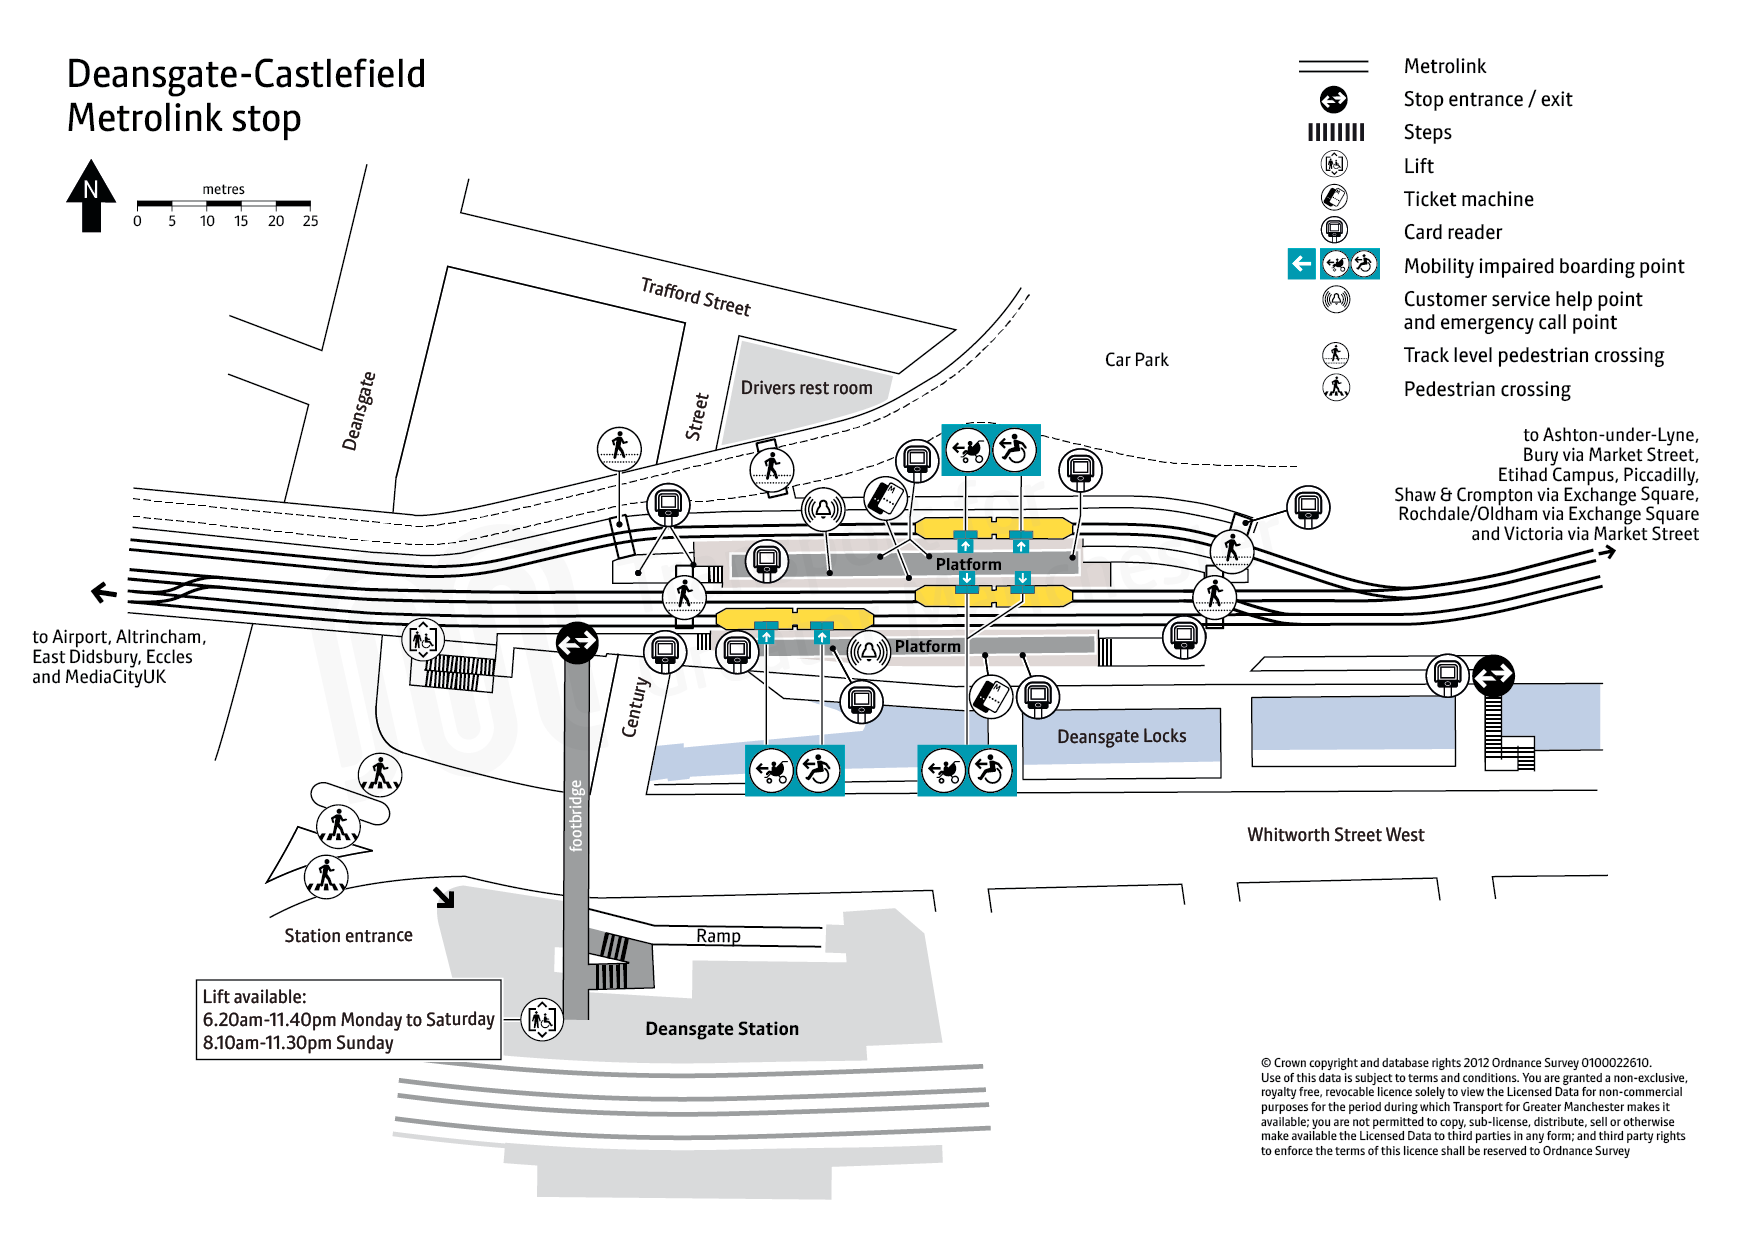 Stop map for Deansgate-Castlefield tram stop